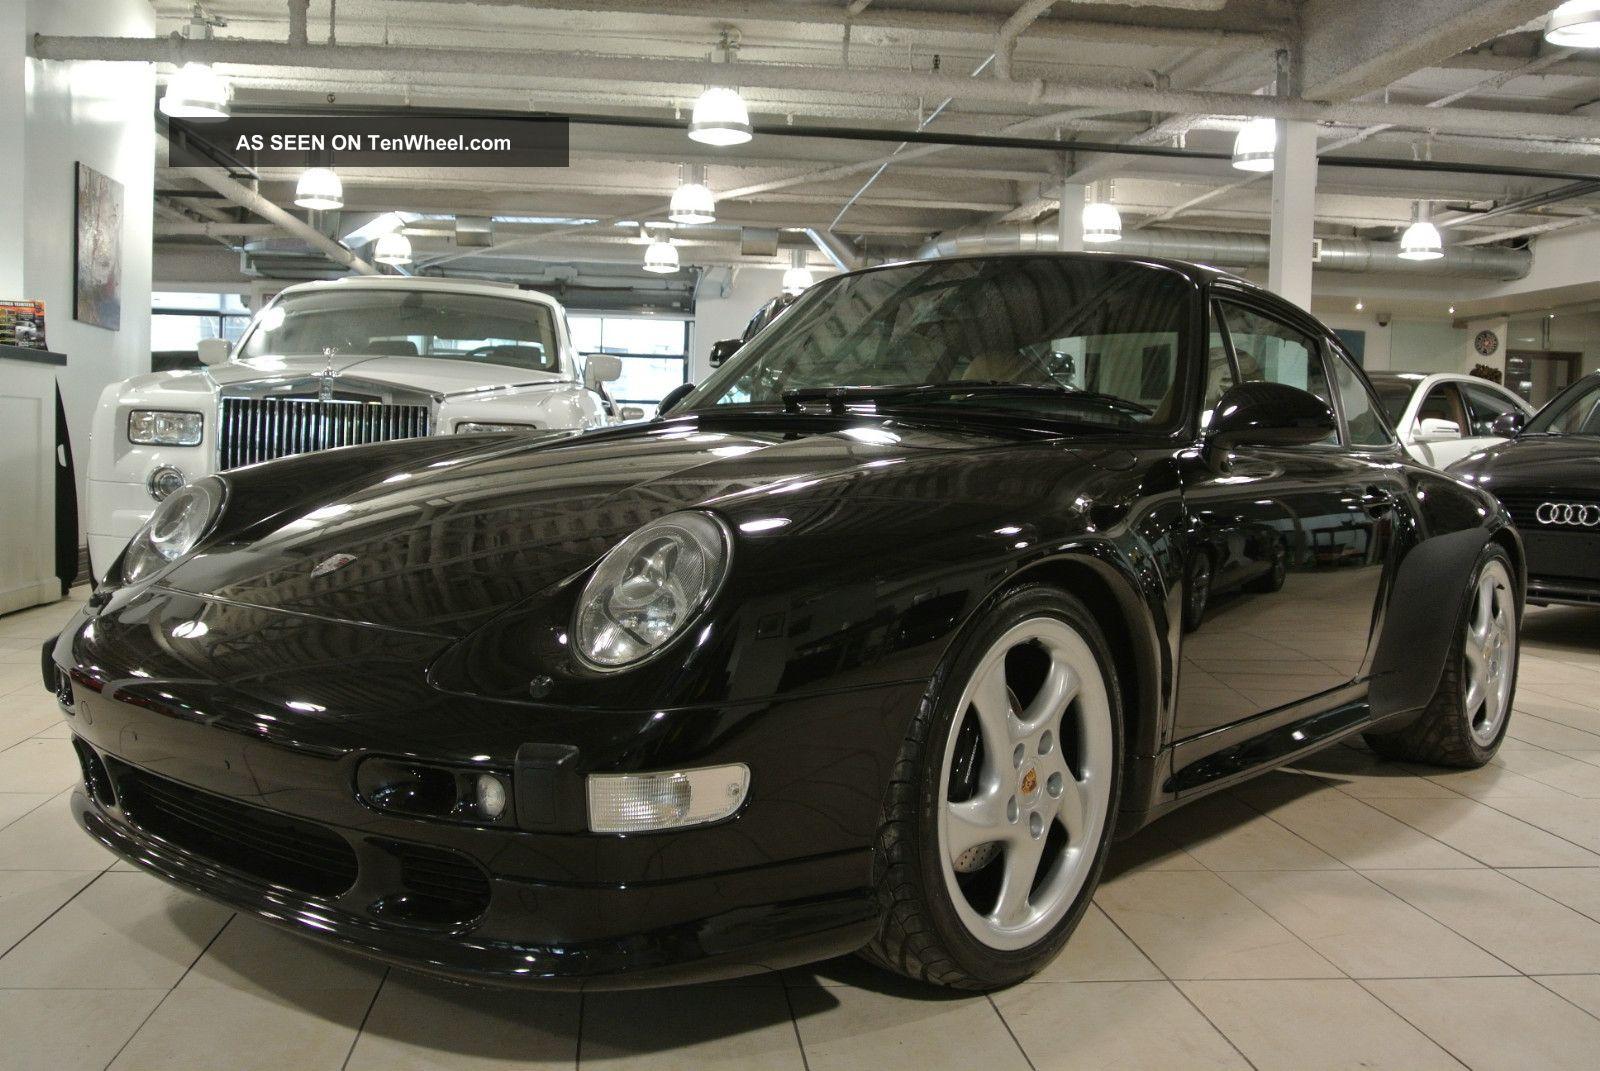 1998 porsche 911 carrera s 993 c2s. Black Bedroom Furniture Sets. Home Design Ideas